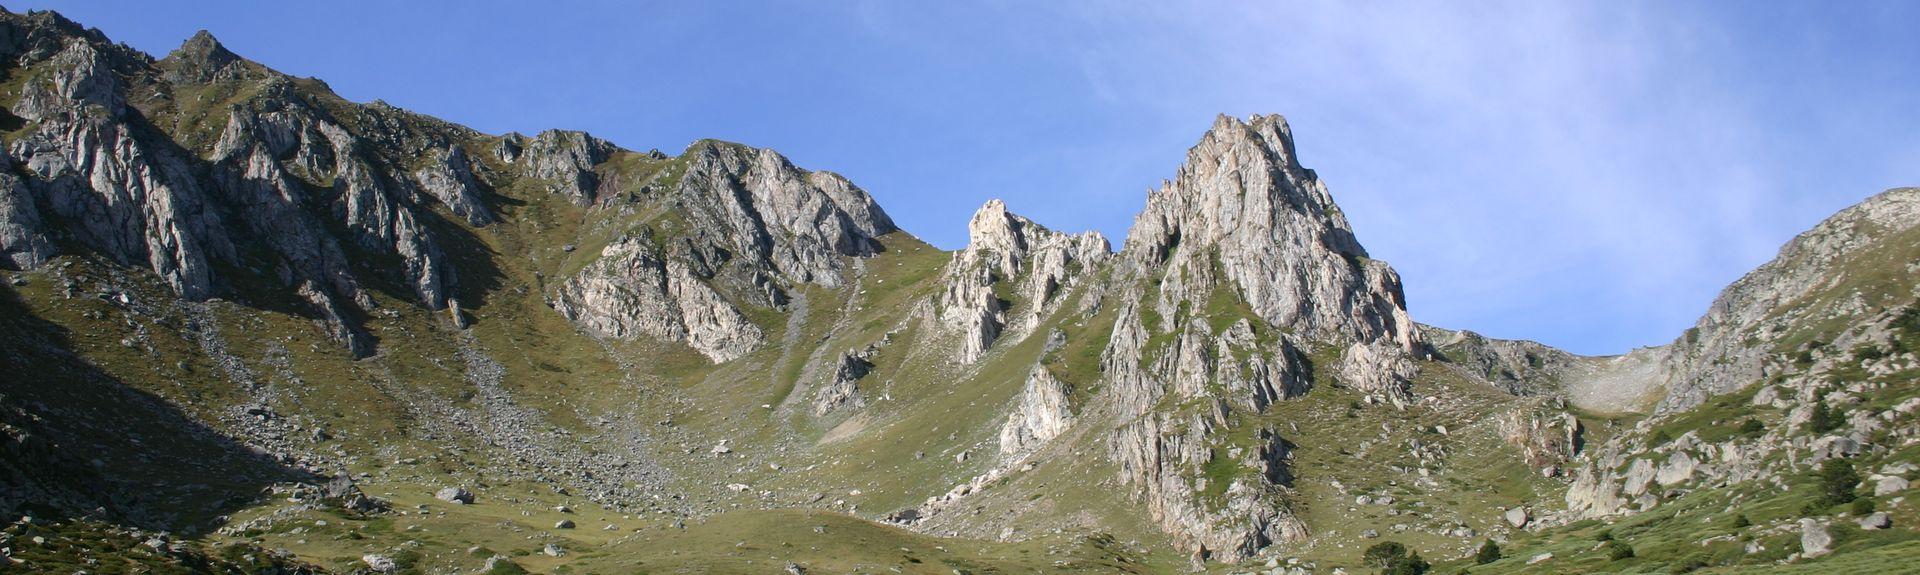 Puilaurens, Occitanie, France